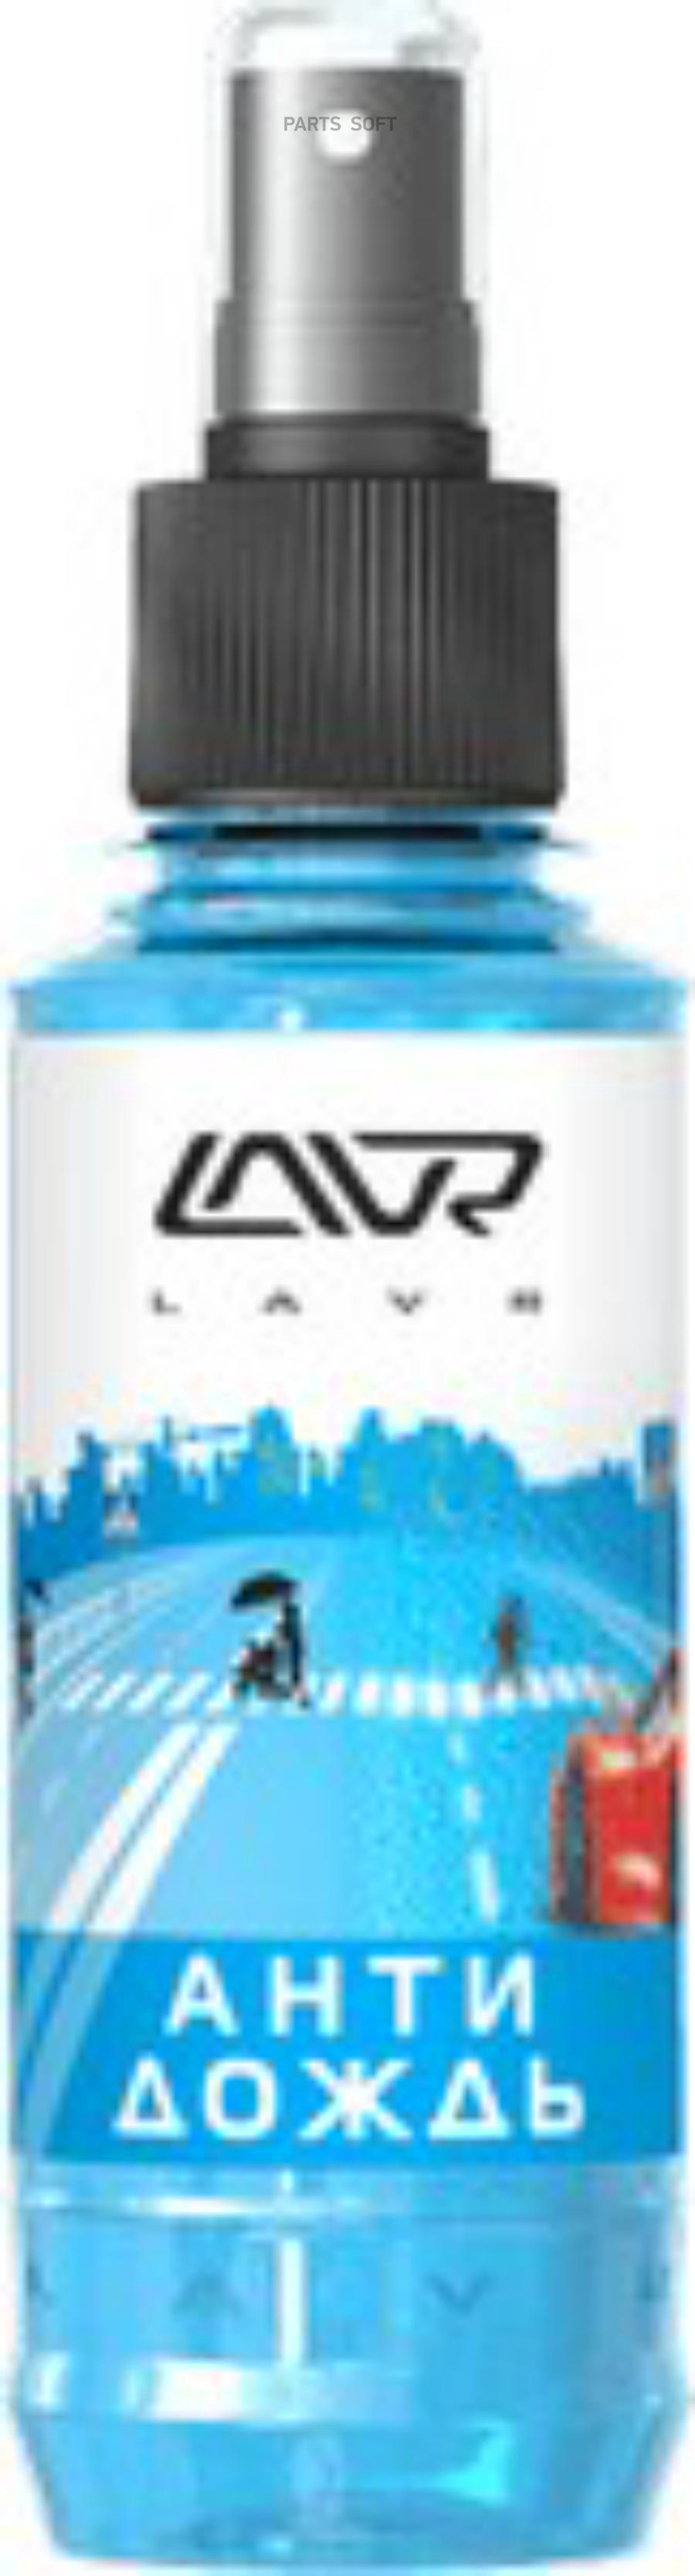 Анти Дождь с Грязеотталкивающим Эффектом LAVR Anti Rain with Dirt-Repellent effect 185мл